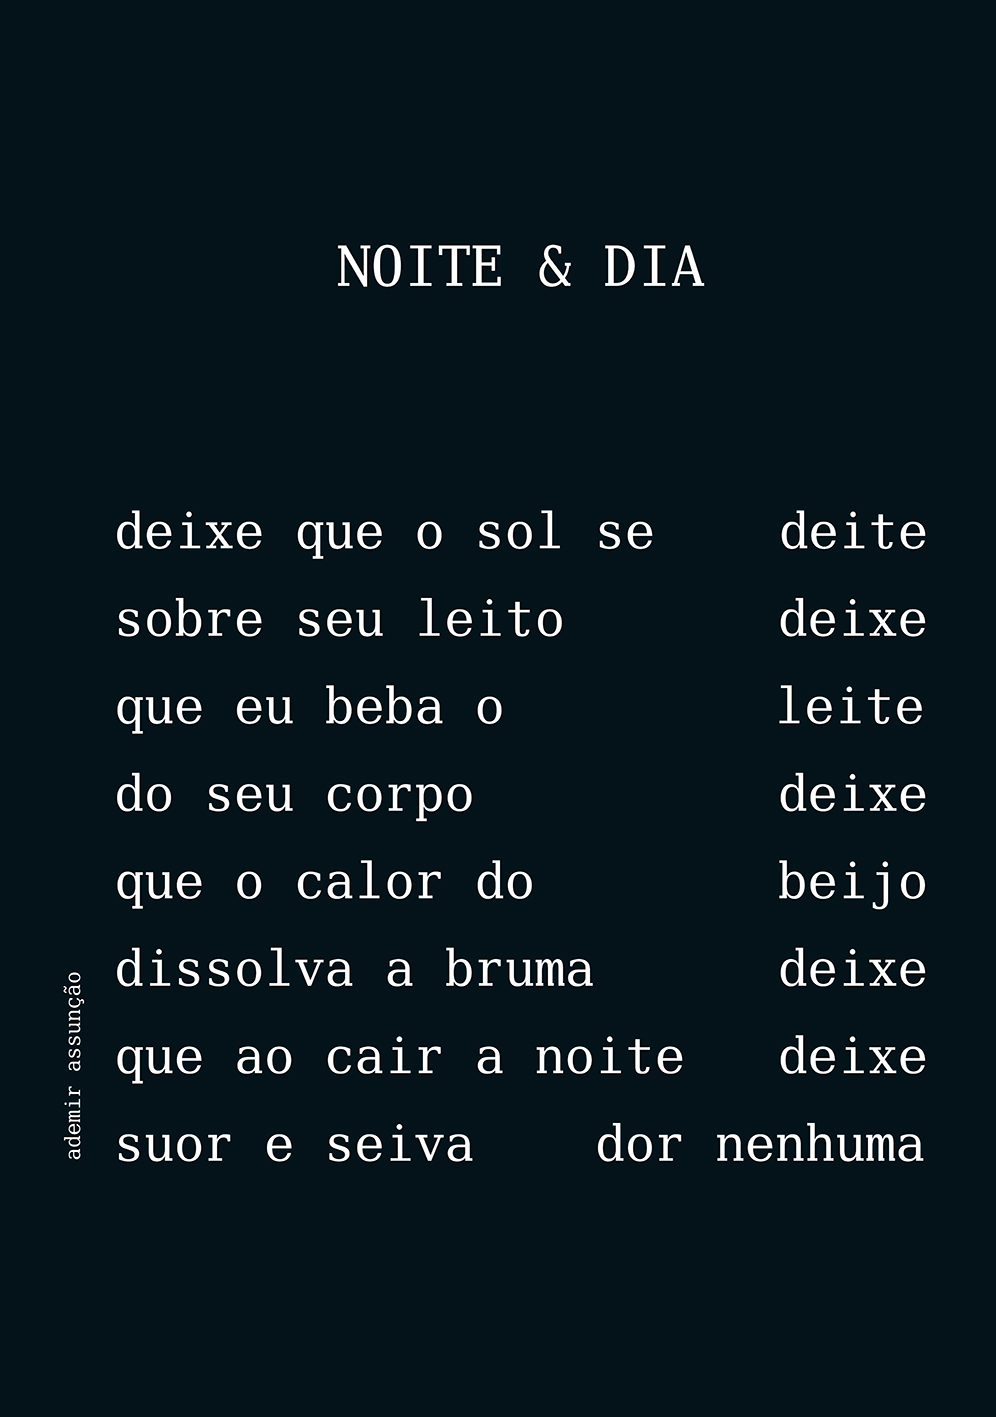 Noite & Dia